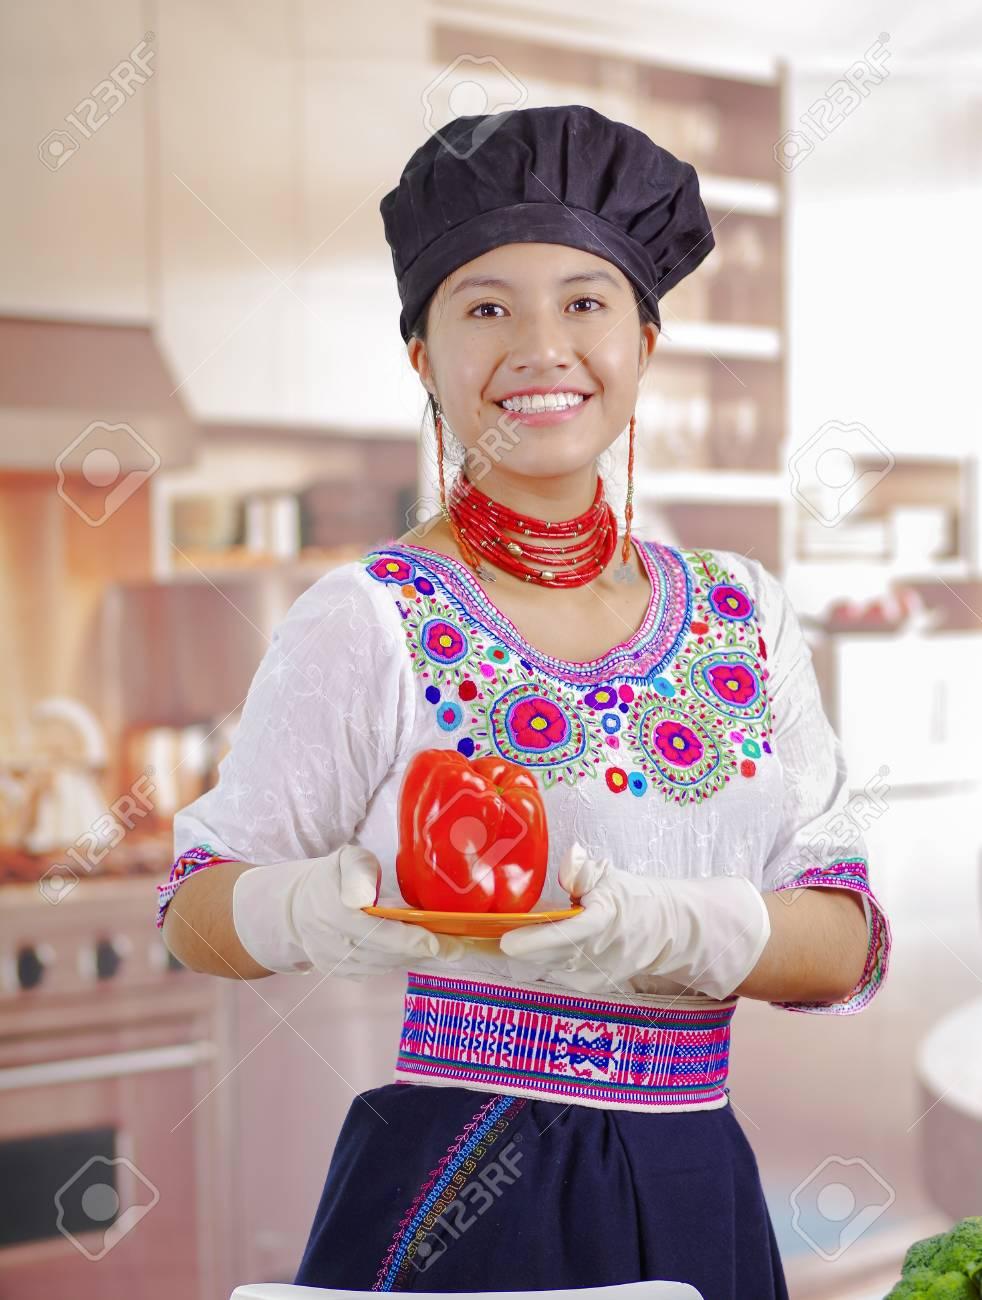 Großer schwarzer Koch